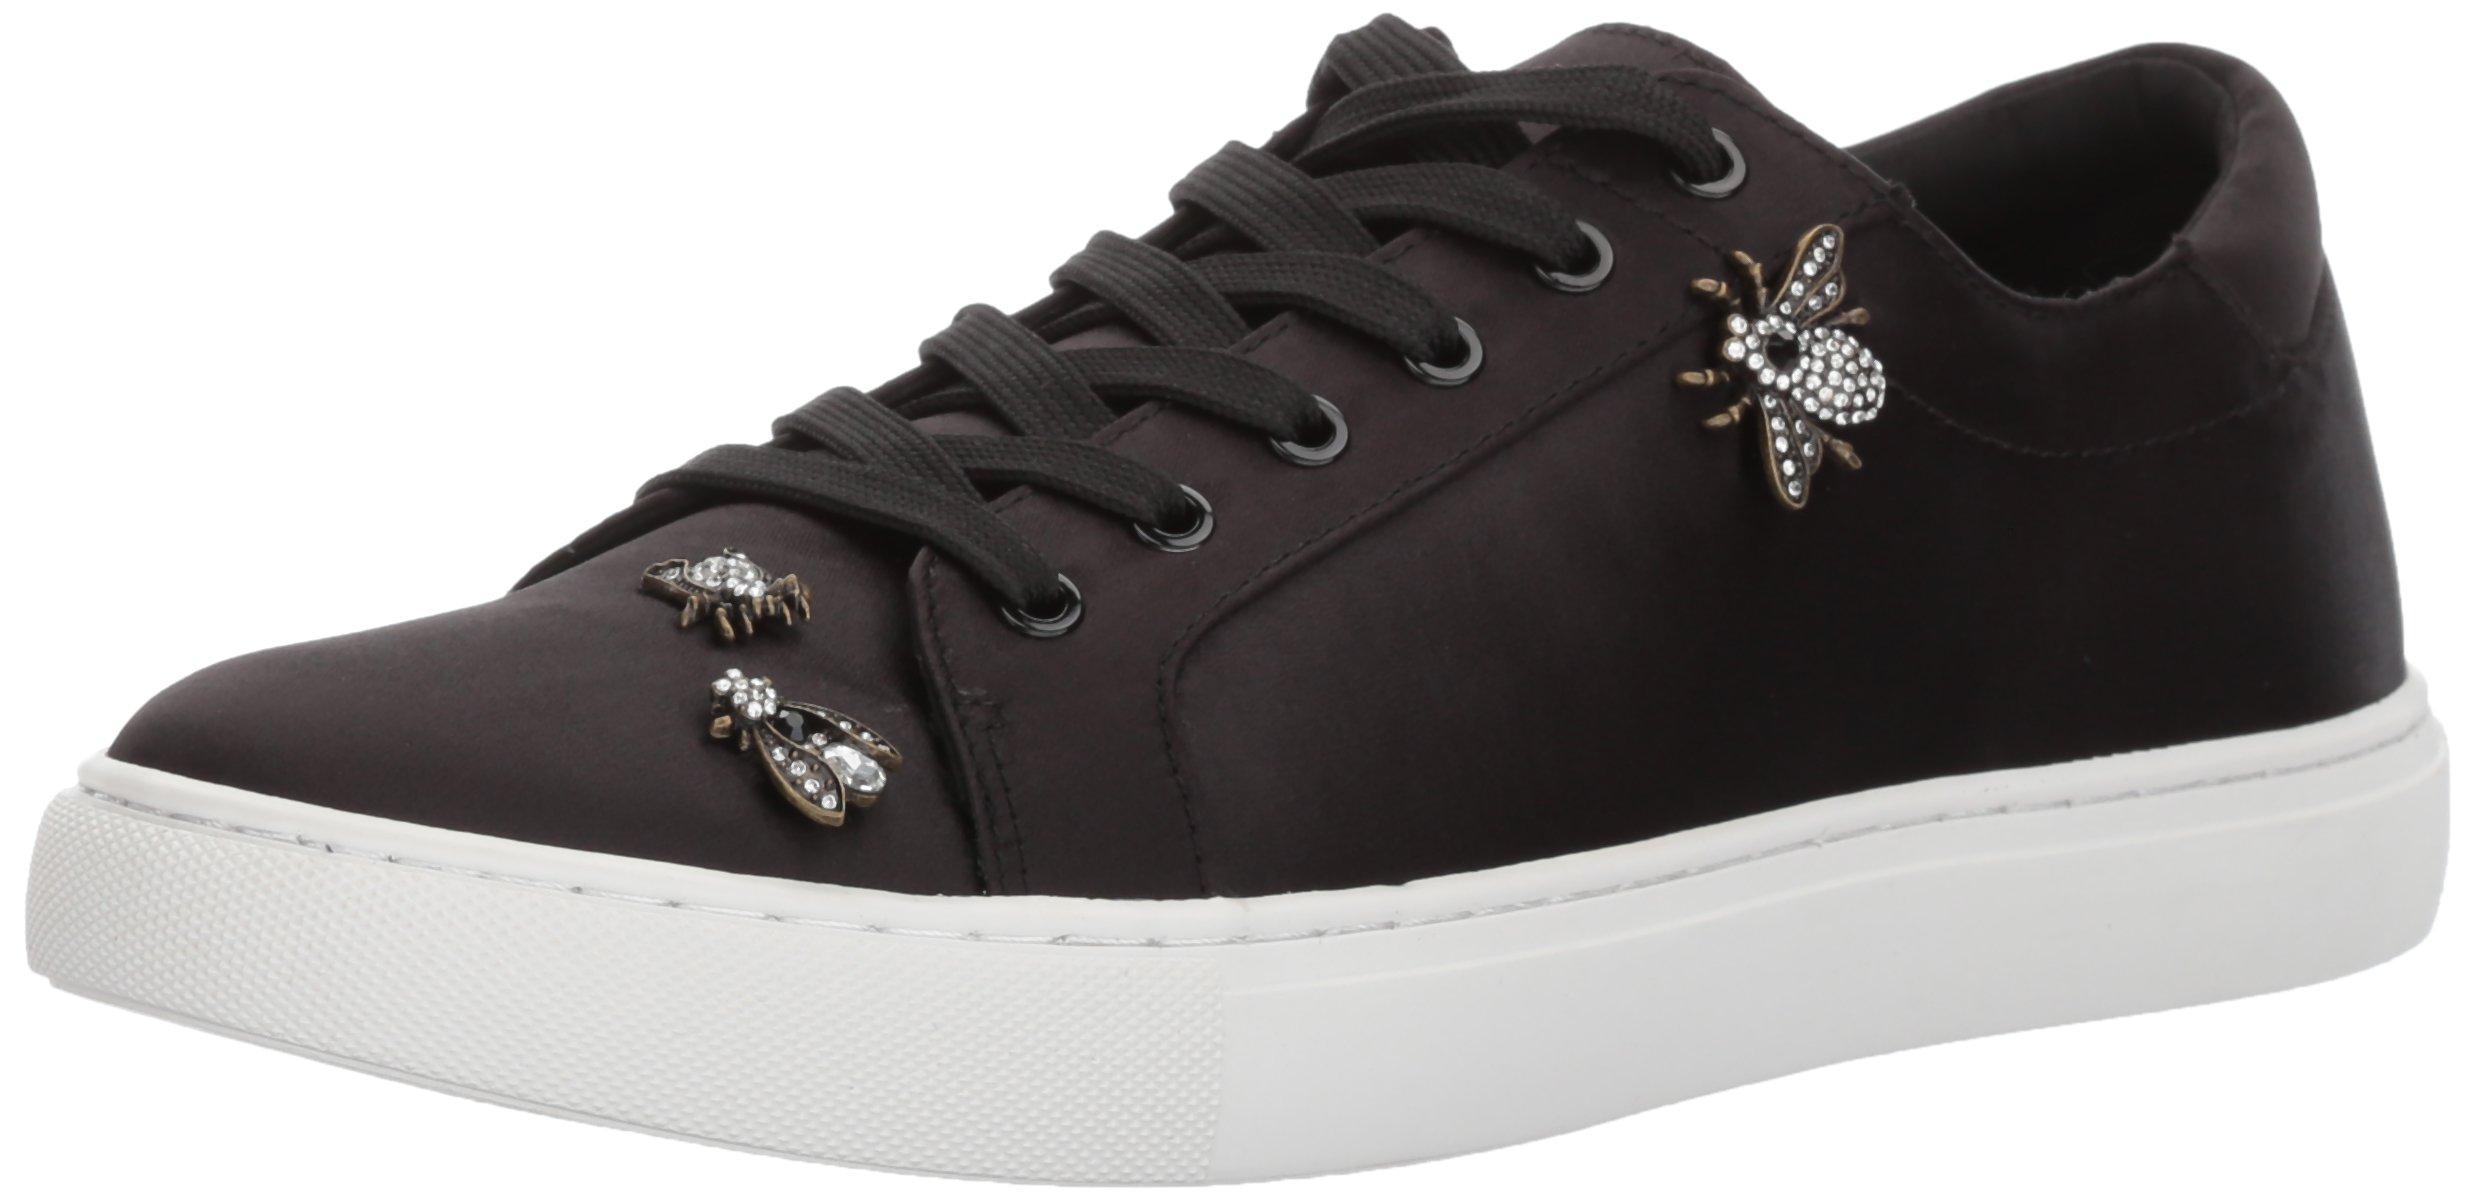 8Sneakers Kam Kenneth Cole Basses Eu FemmeNoirblack41 HEDW29I